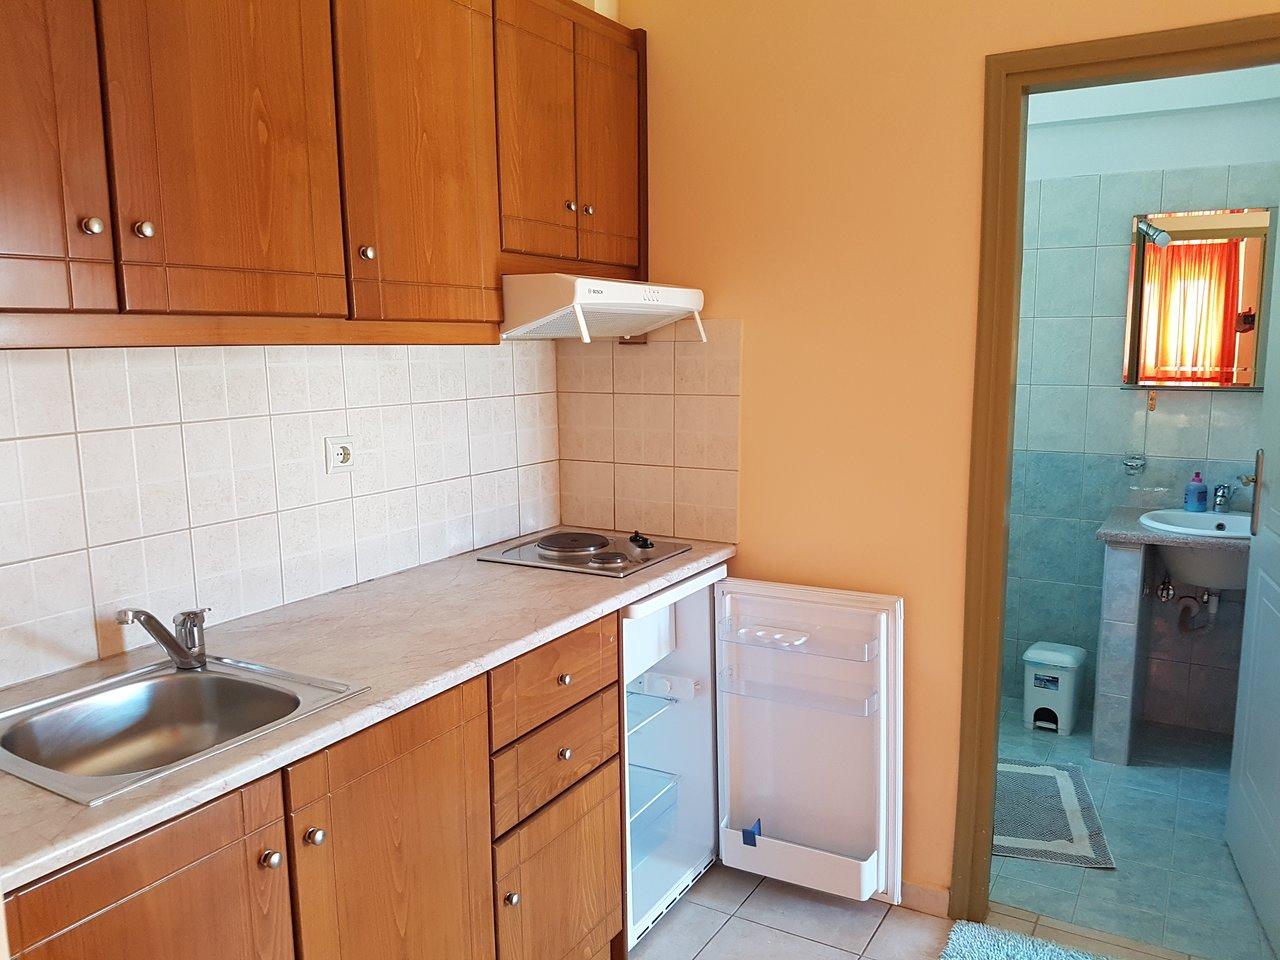 bayside apartments studios prices condominium reviews lefkada rh tripadvisor com